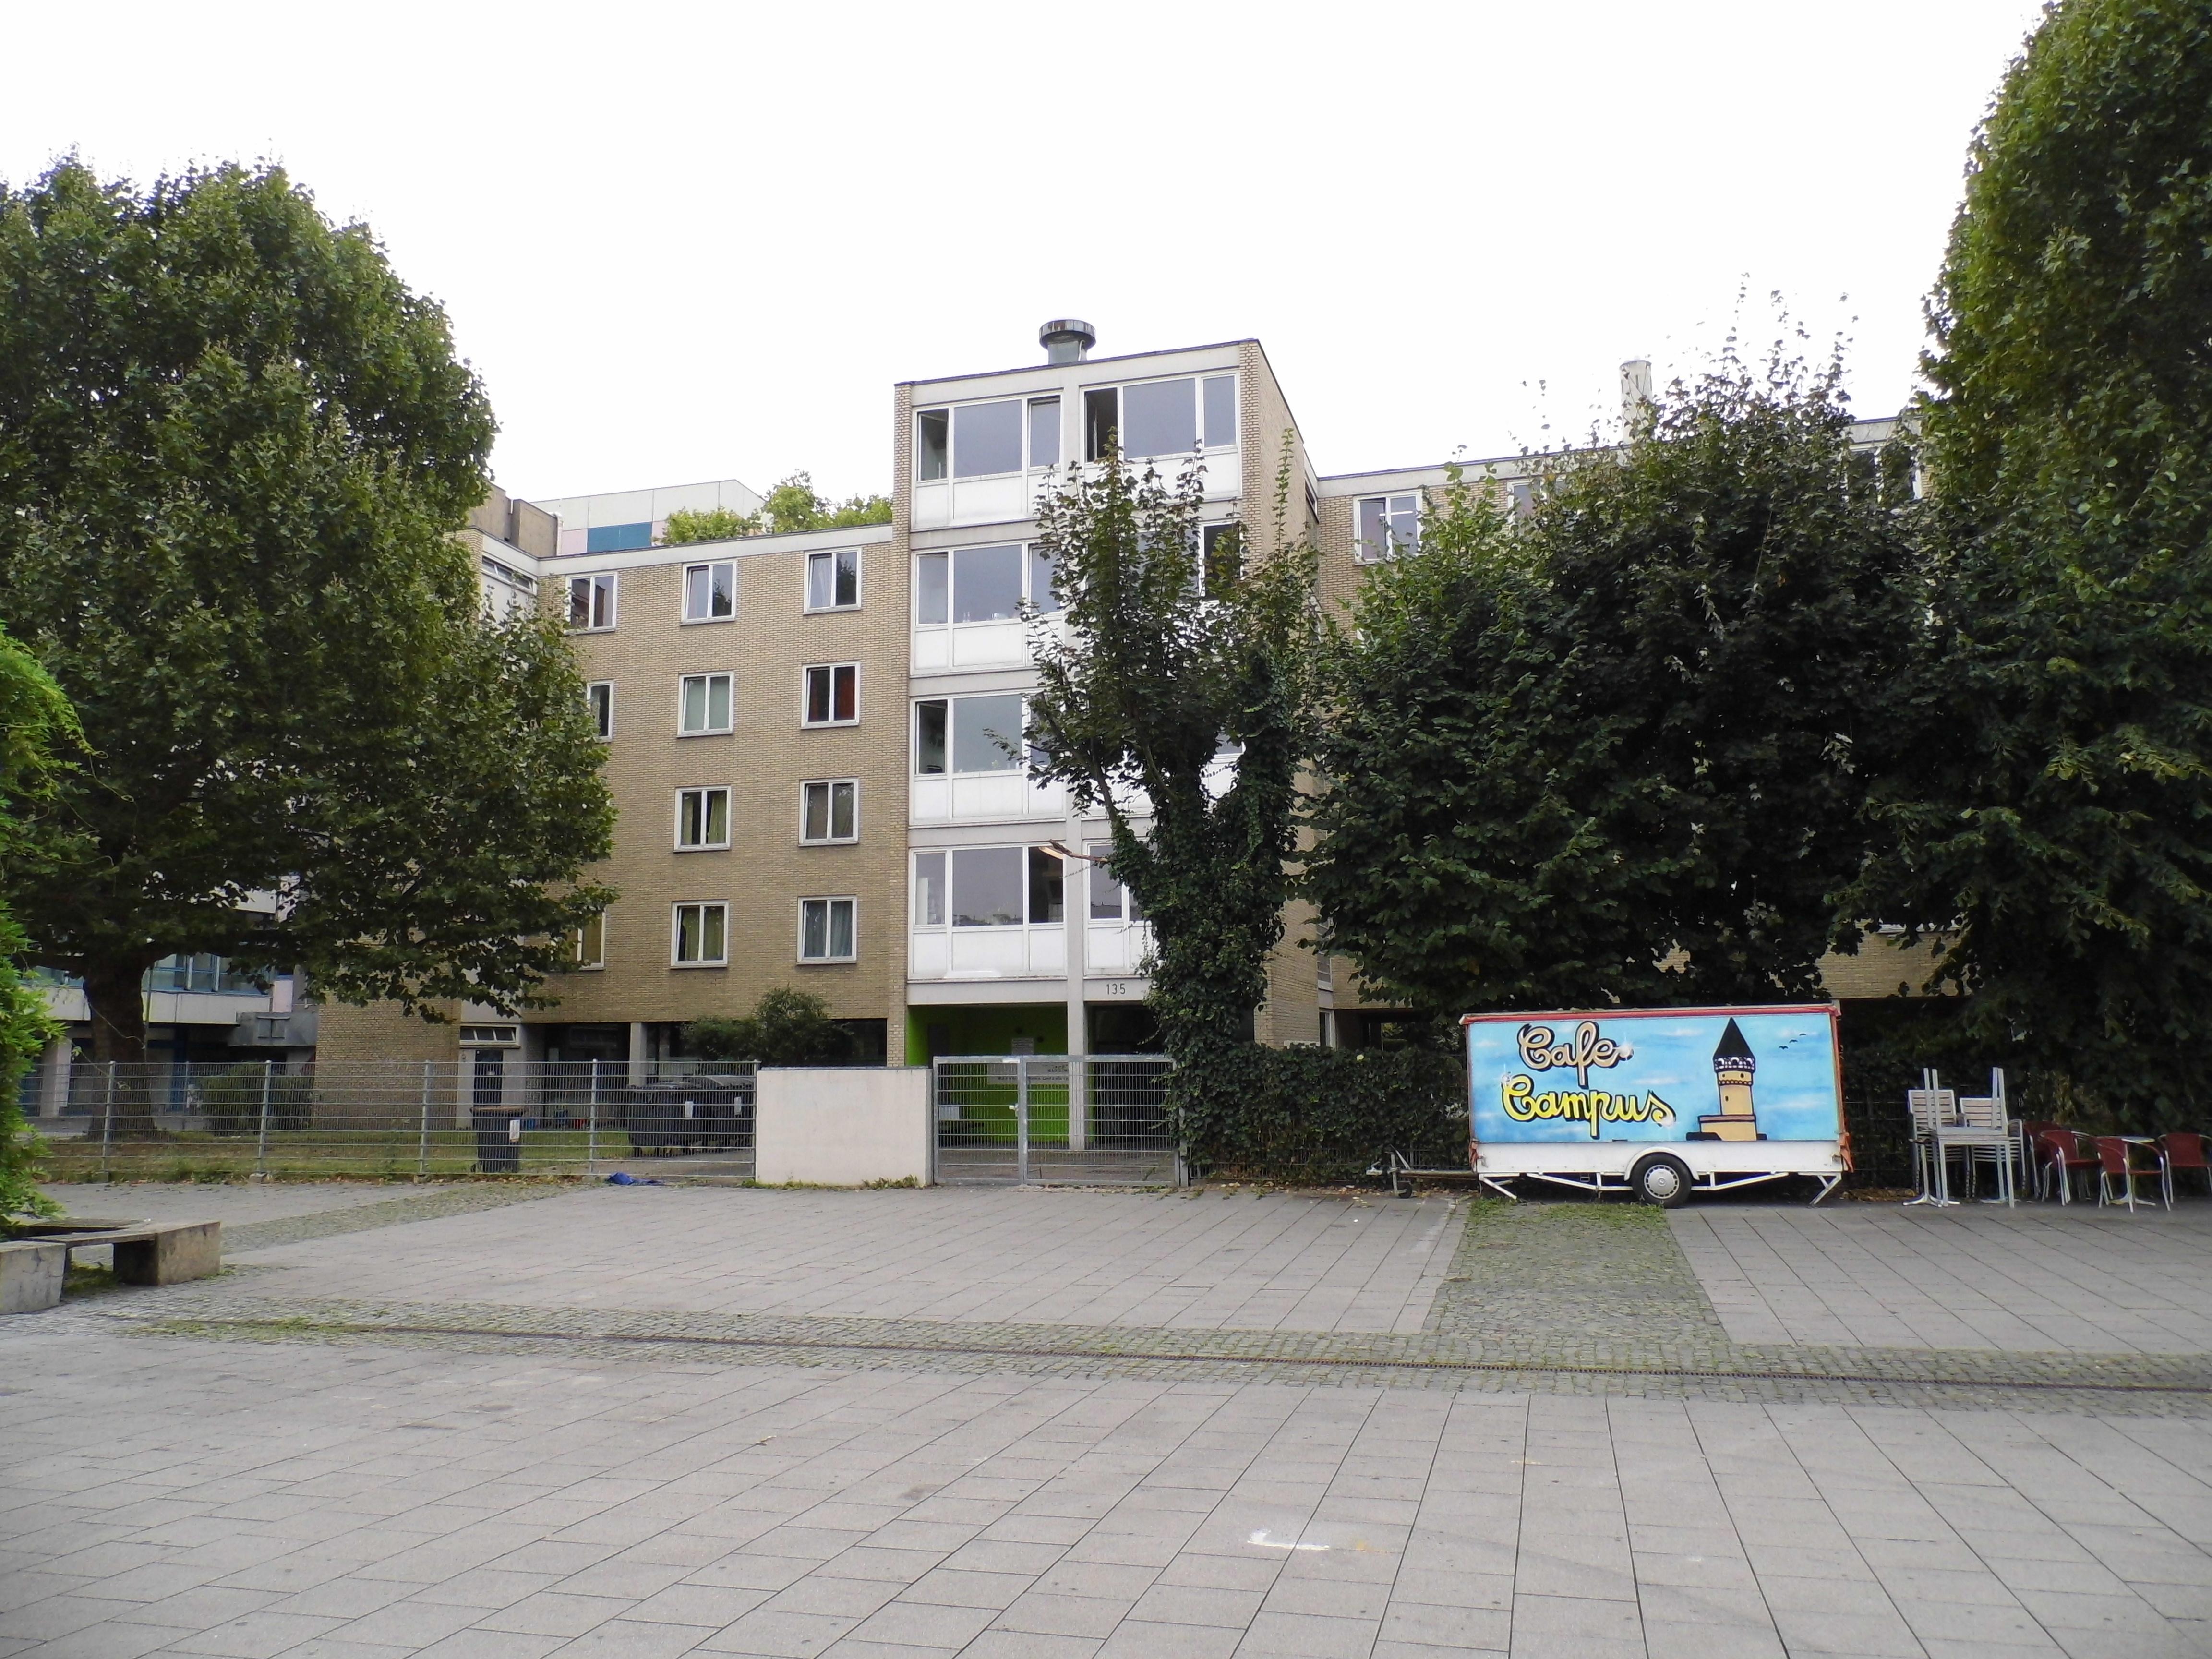 File:Frankfurt, Studentenwohnheim Bockenheimer Landstraße 135.JPG ...